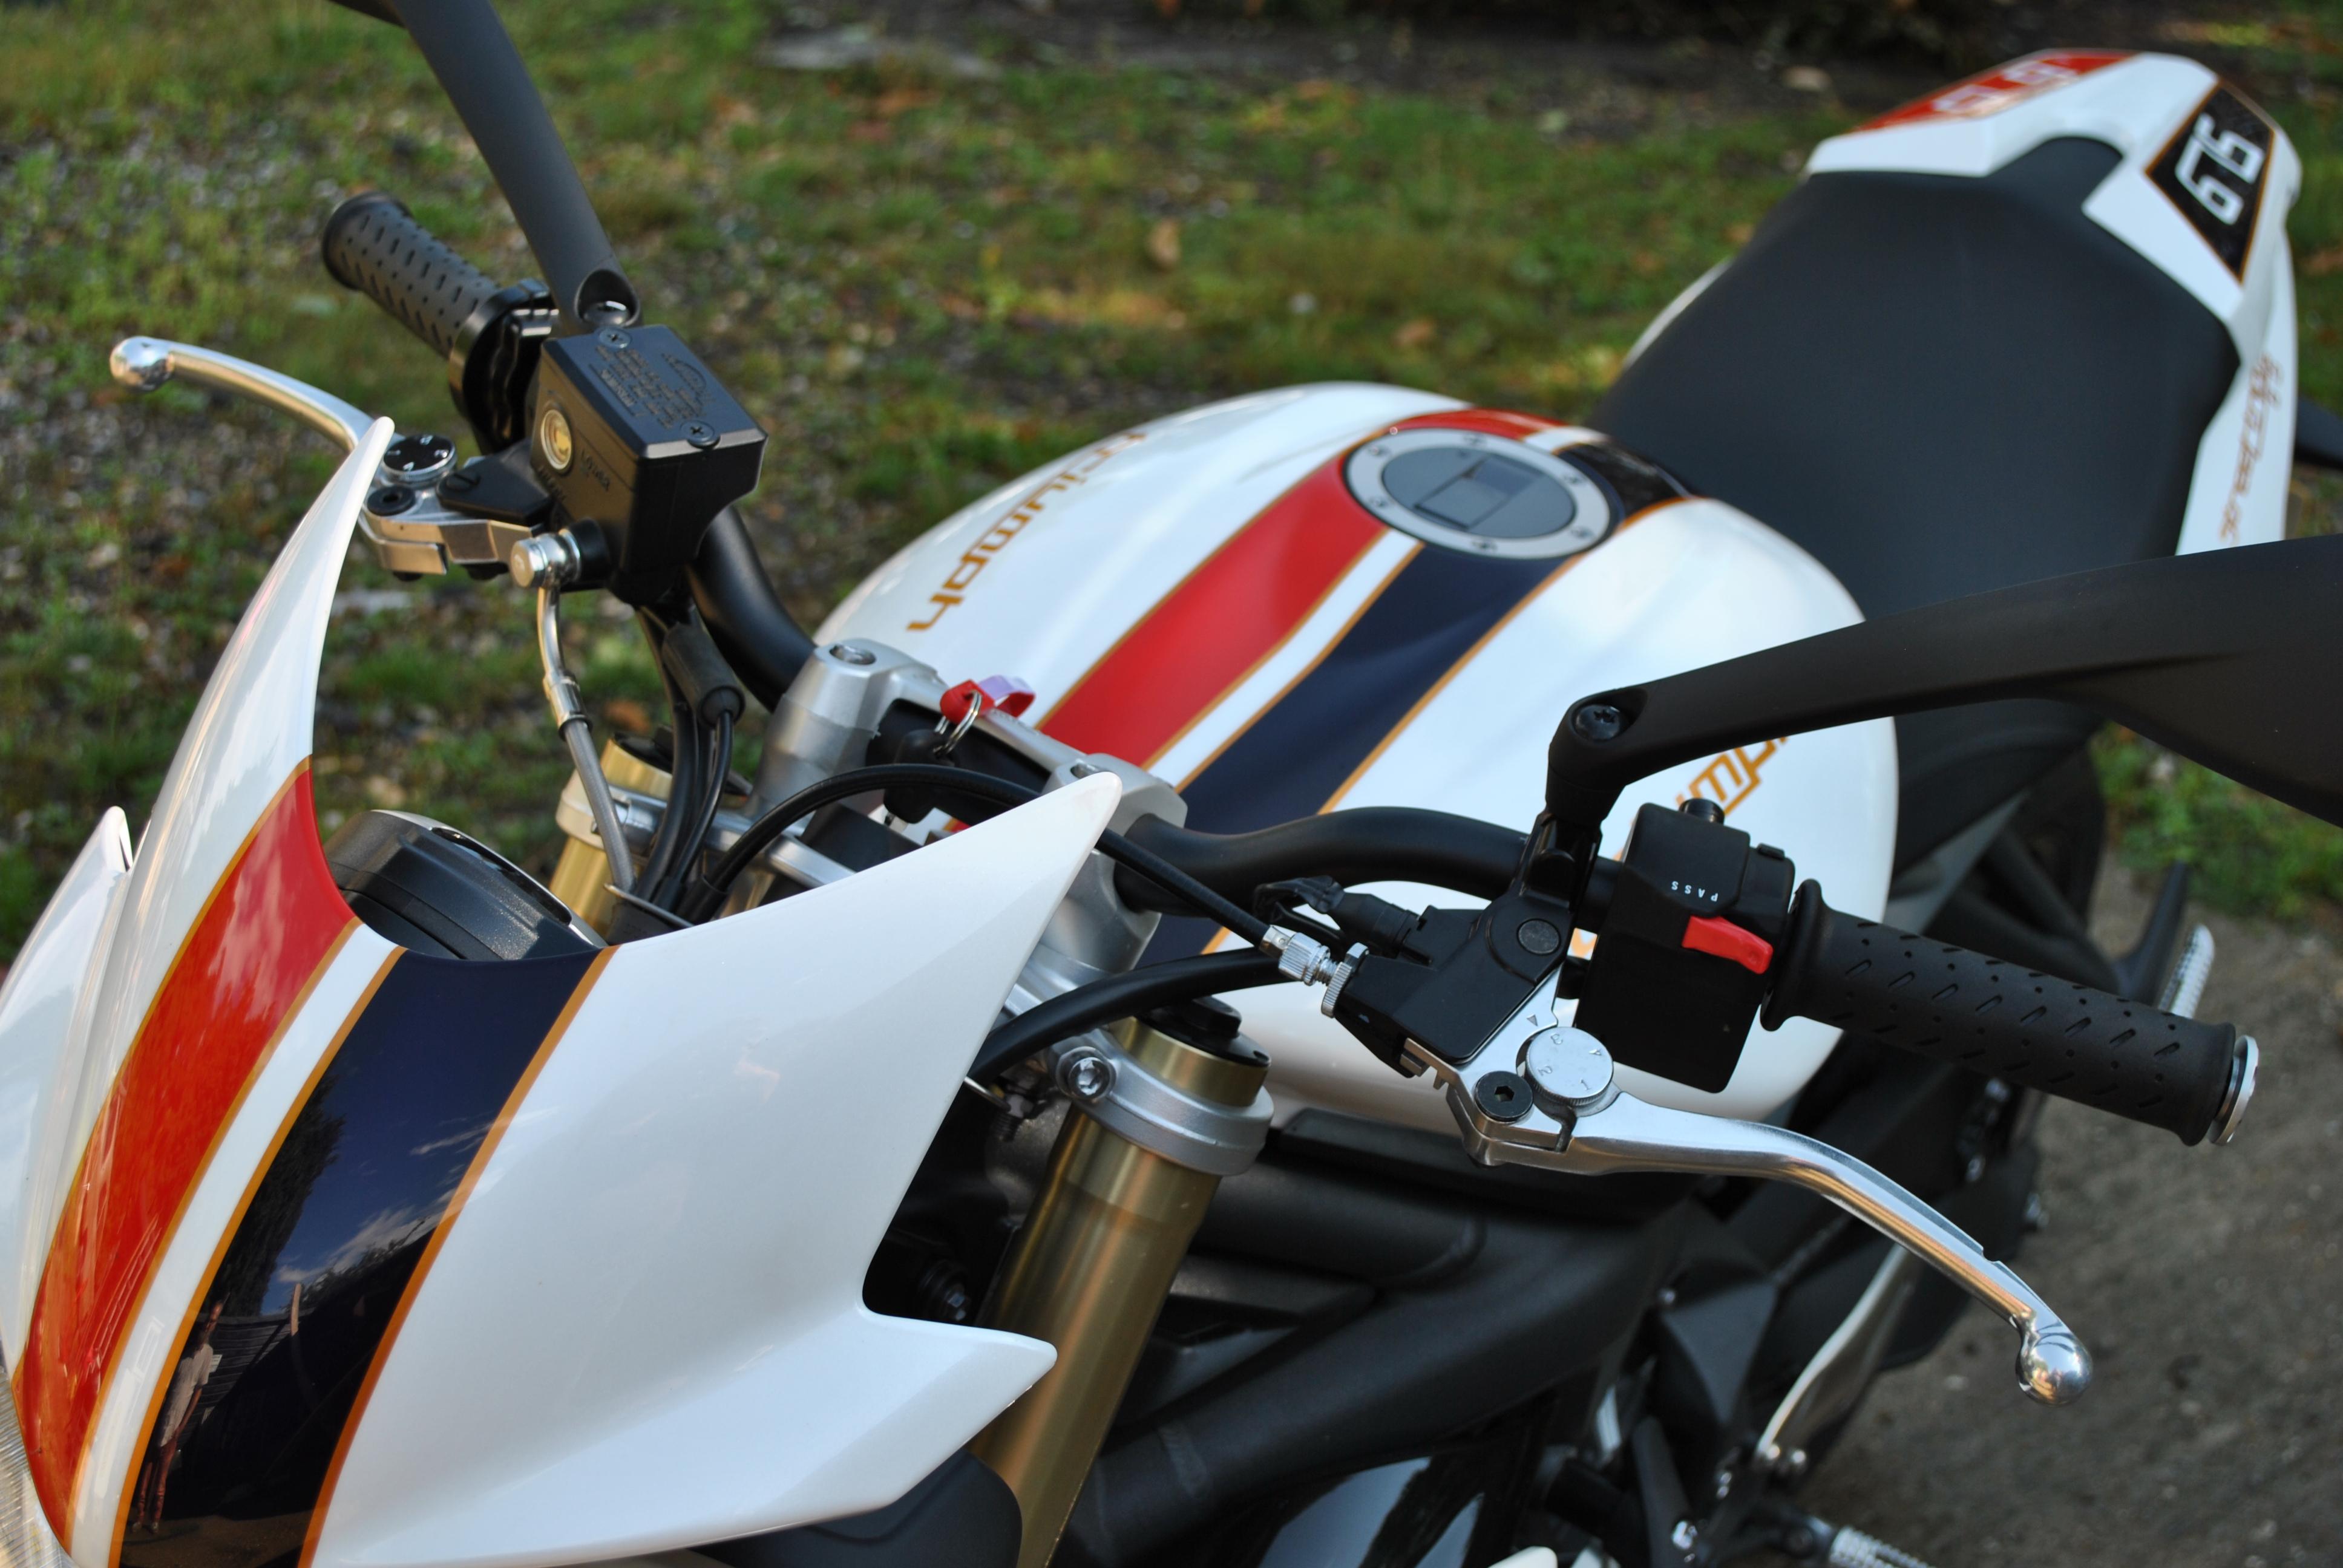 All bikes passess and Triumph 063